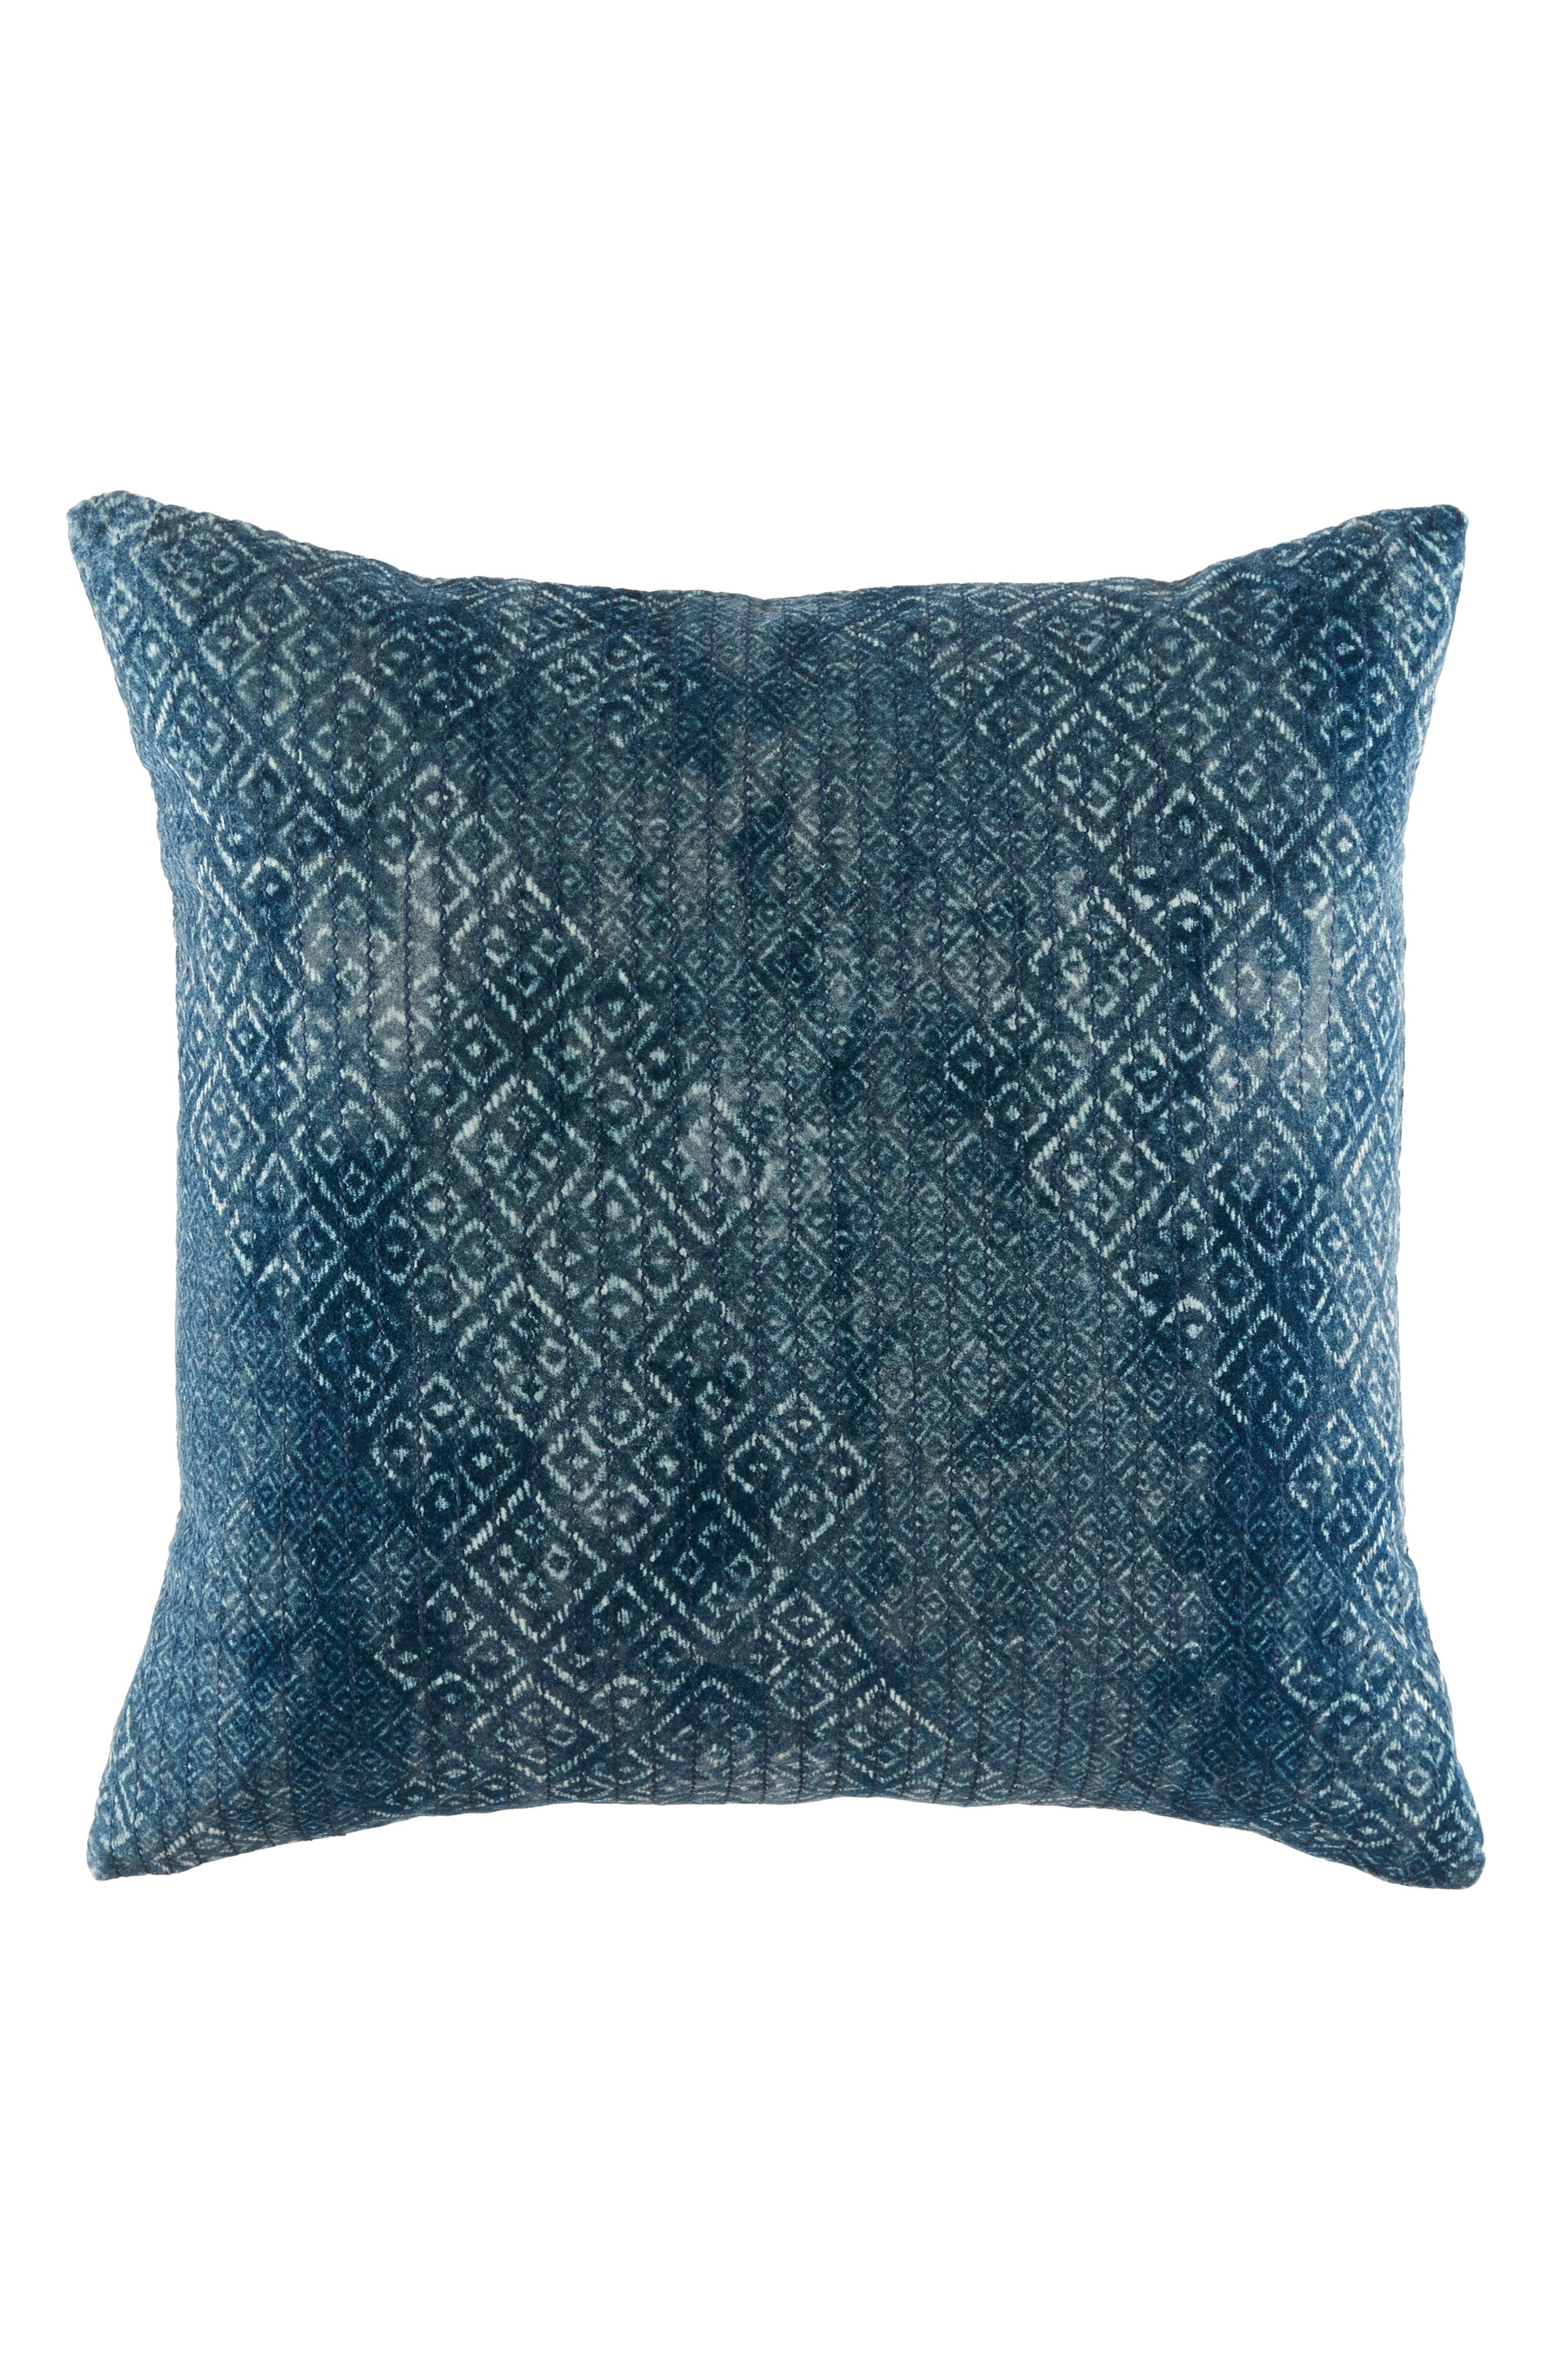 Main Image - DwellStudio Pala Accent Pillow